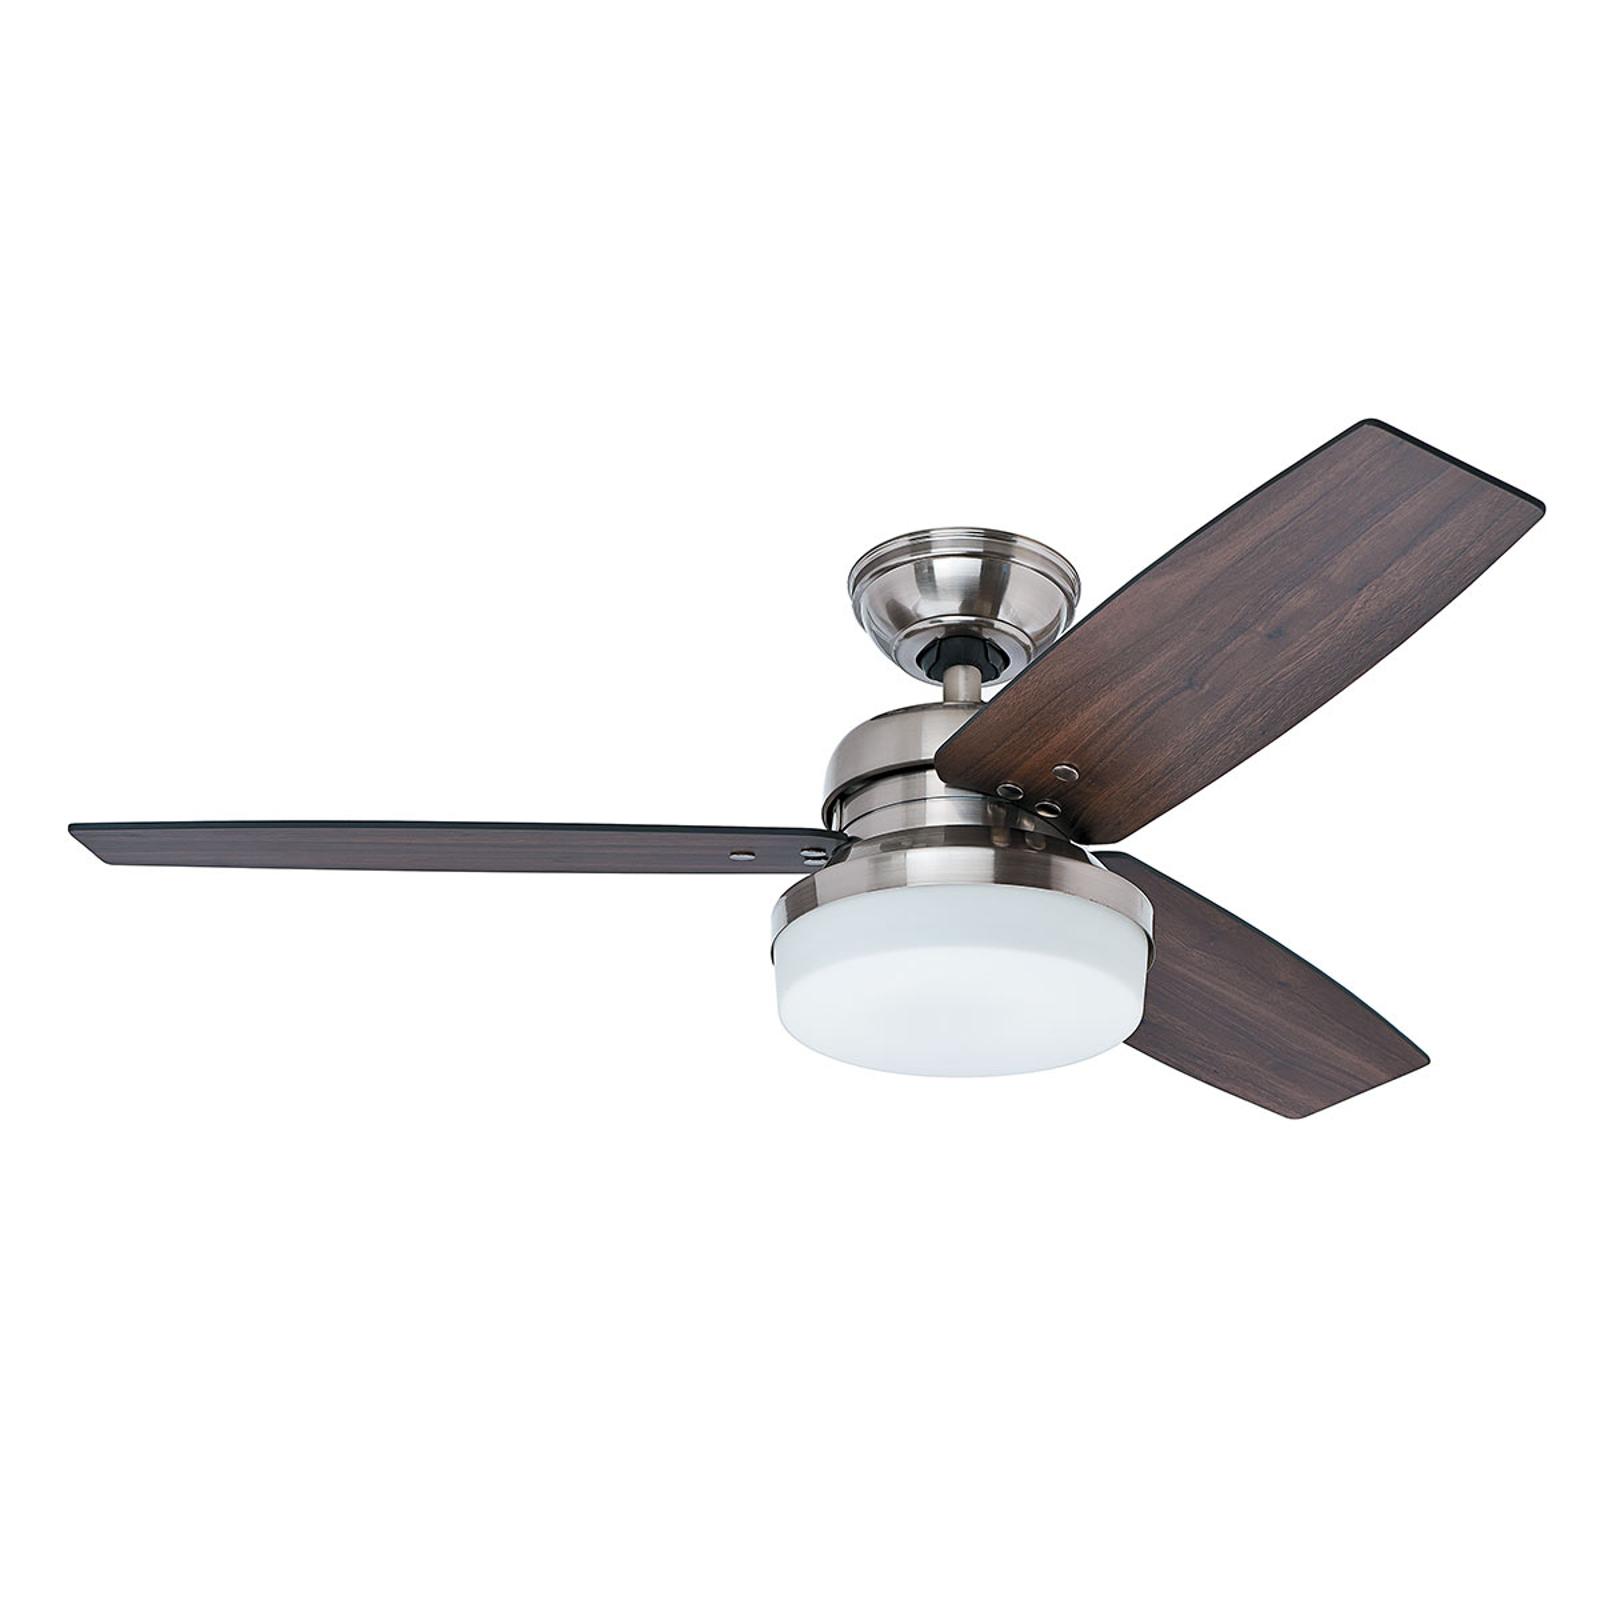 Hunter Galileo ventilateur éclairage, noyer/chêne